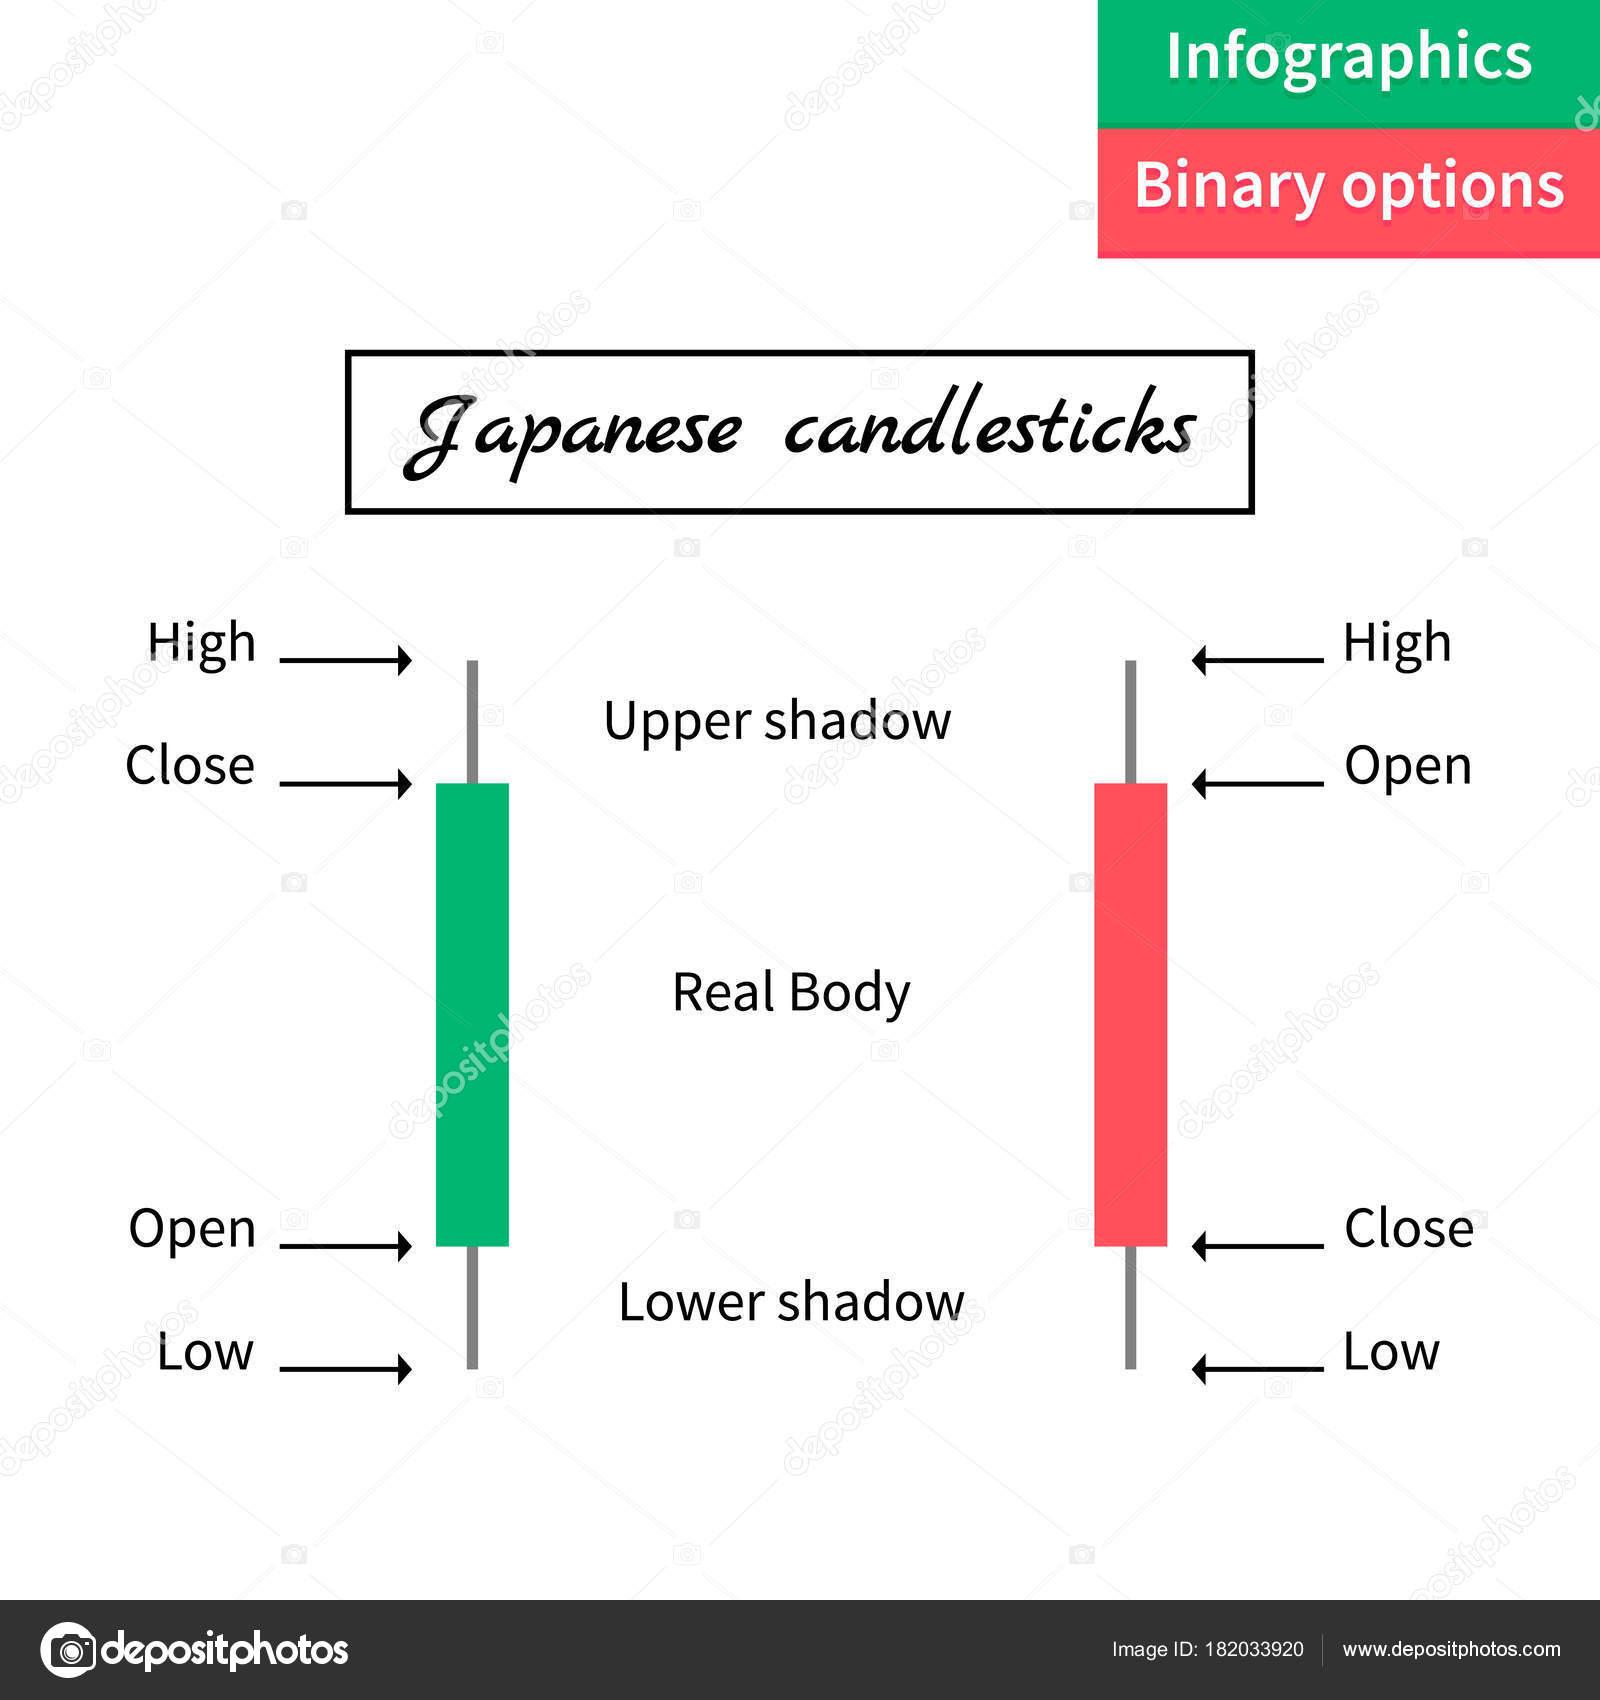 bináris opciók infographics